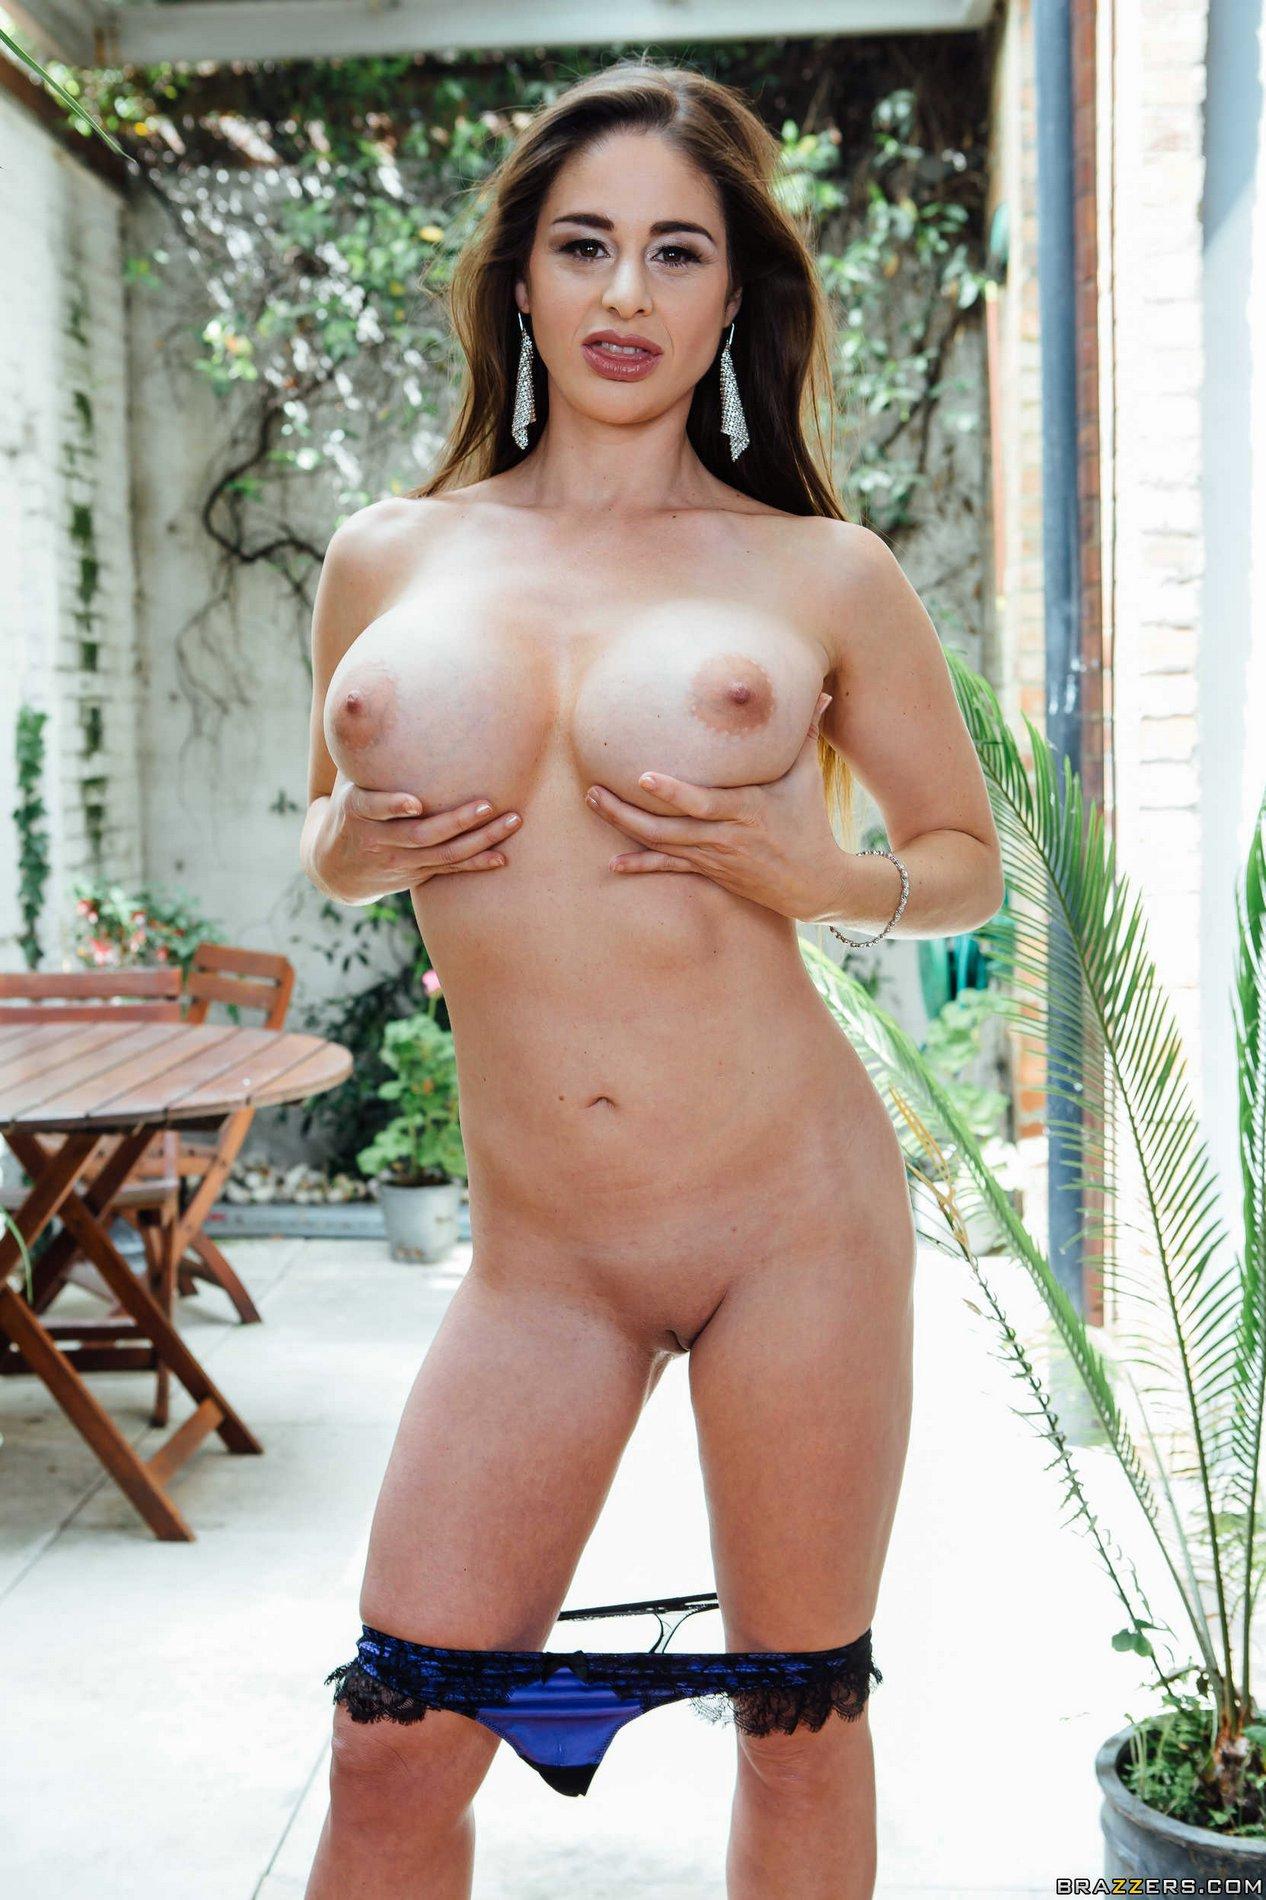 Cathy Heaven exposes her hot body - My Pornstar Book